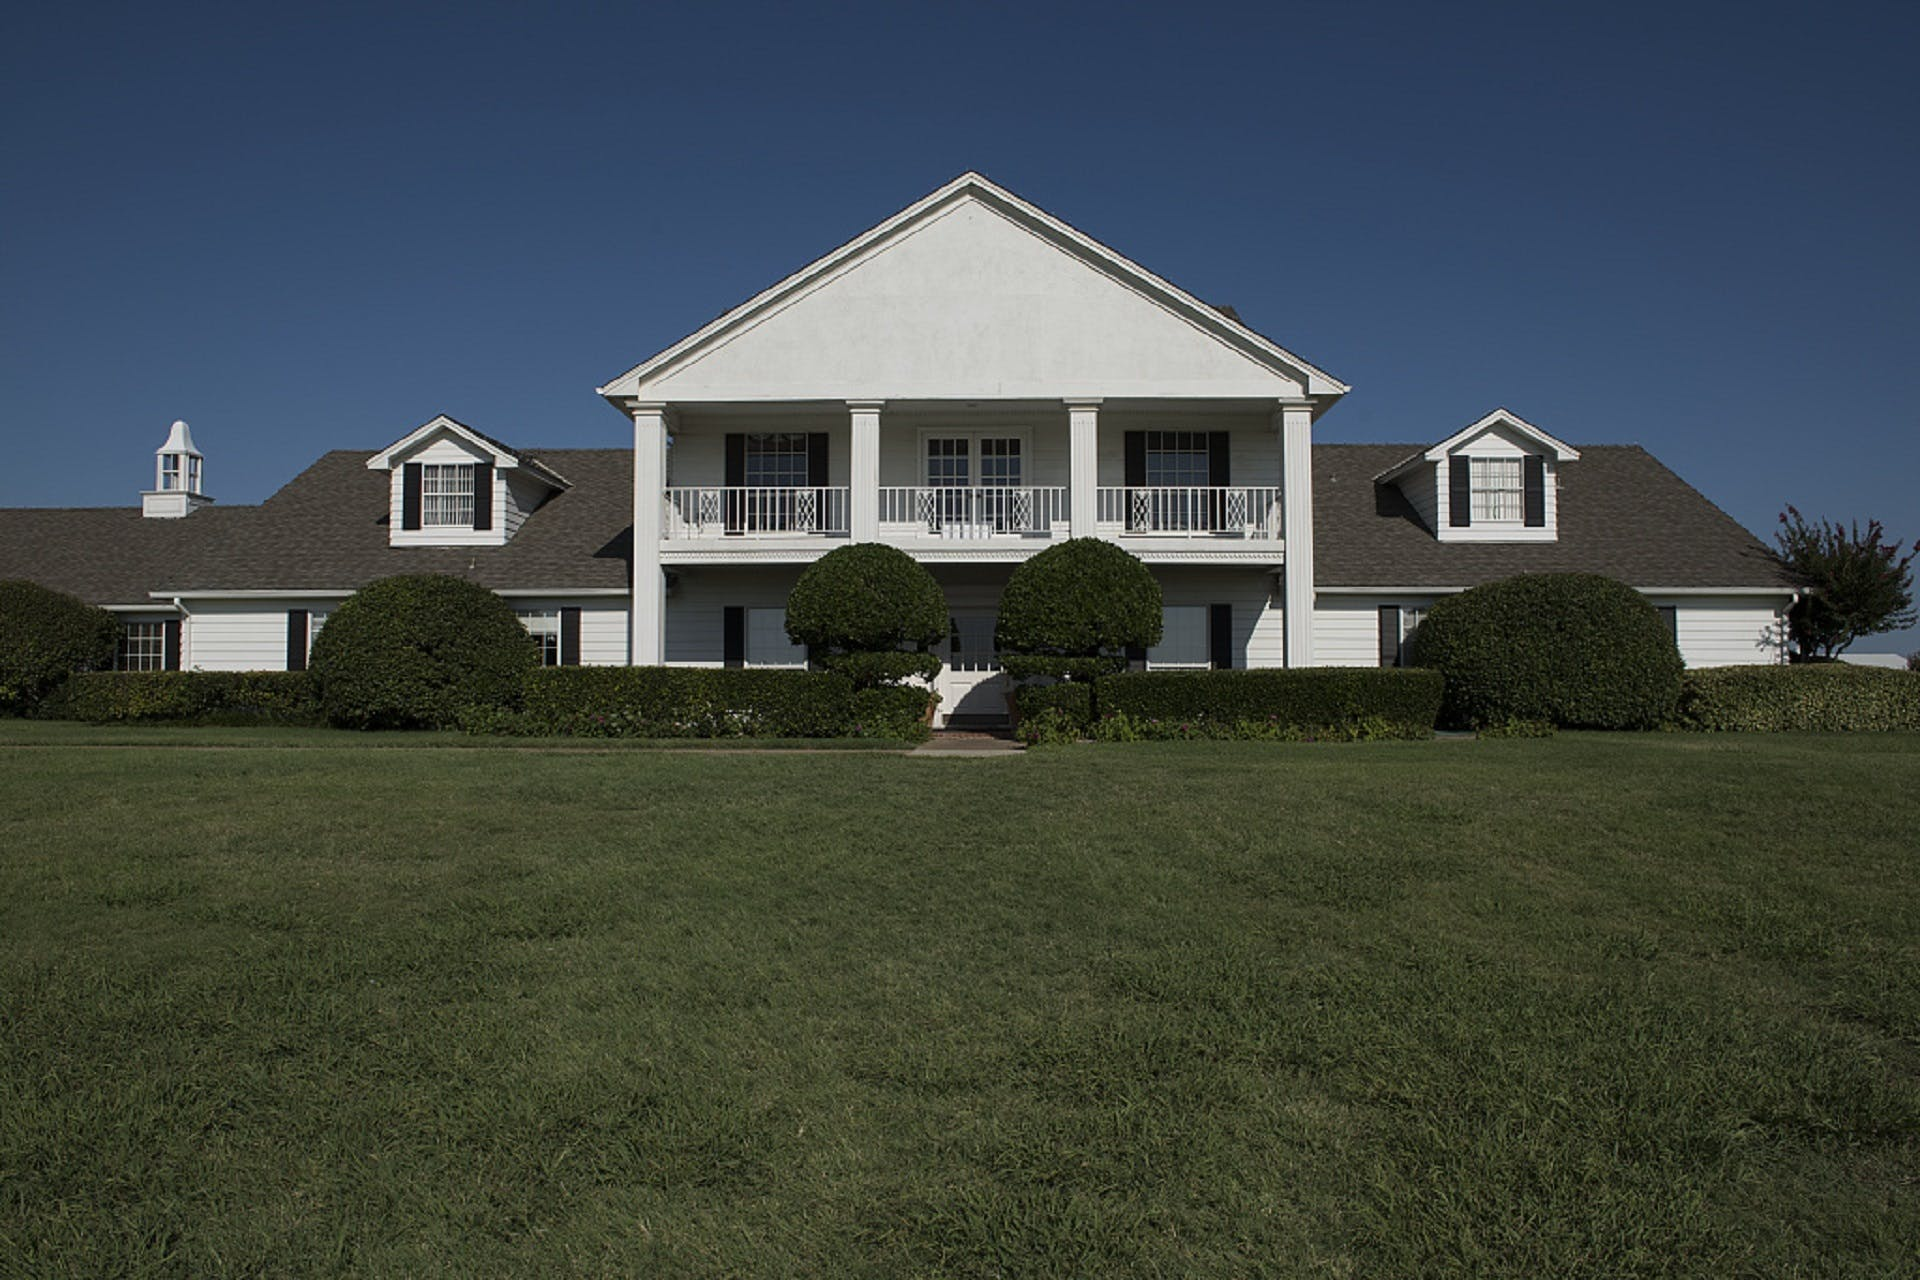 House Beyond Green Plants